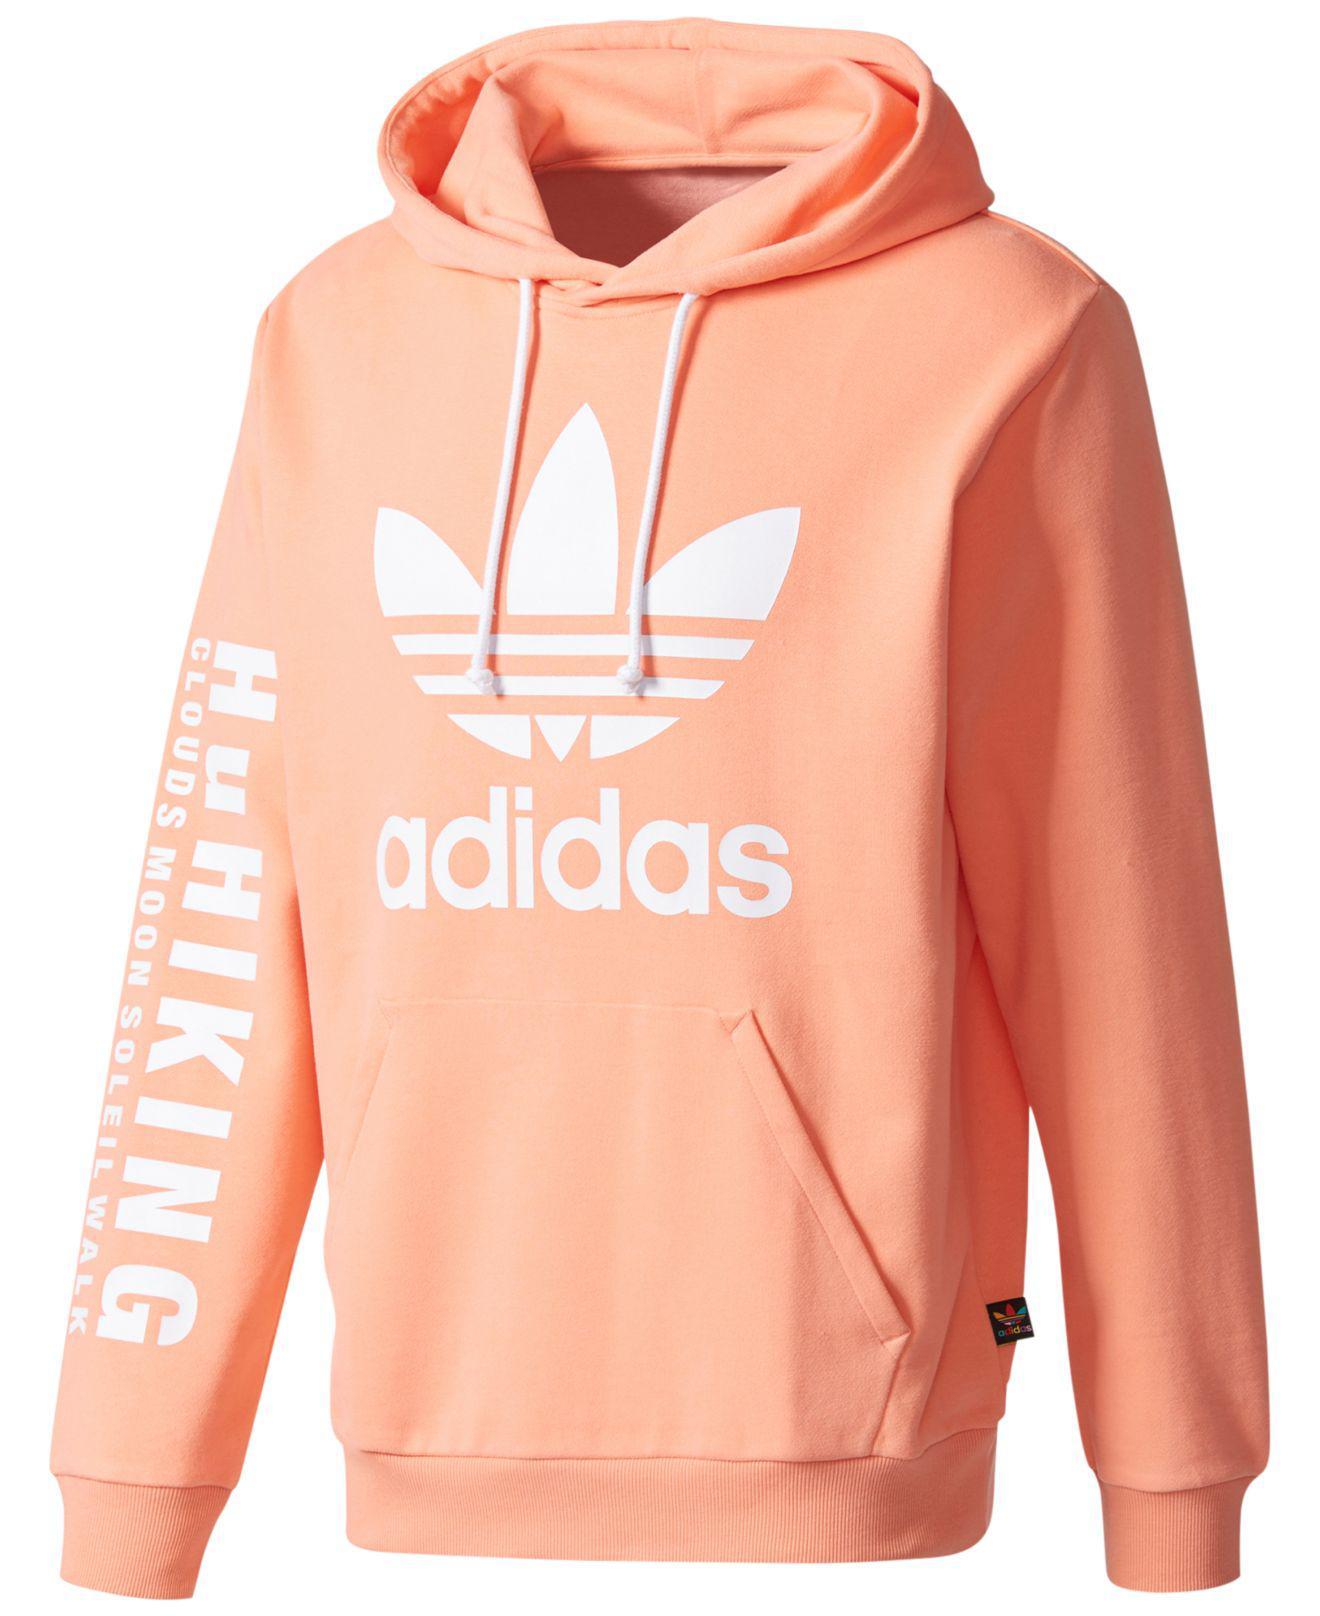 333d1b45fdc8 Lyst - adidas Pharrell Williams Hu Hiking Logo Hoodie in Pink for Men